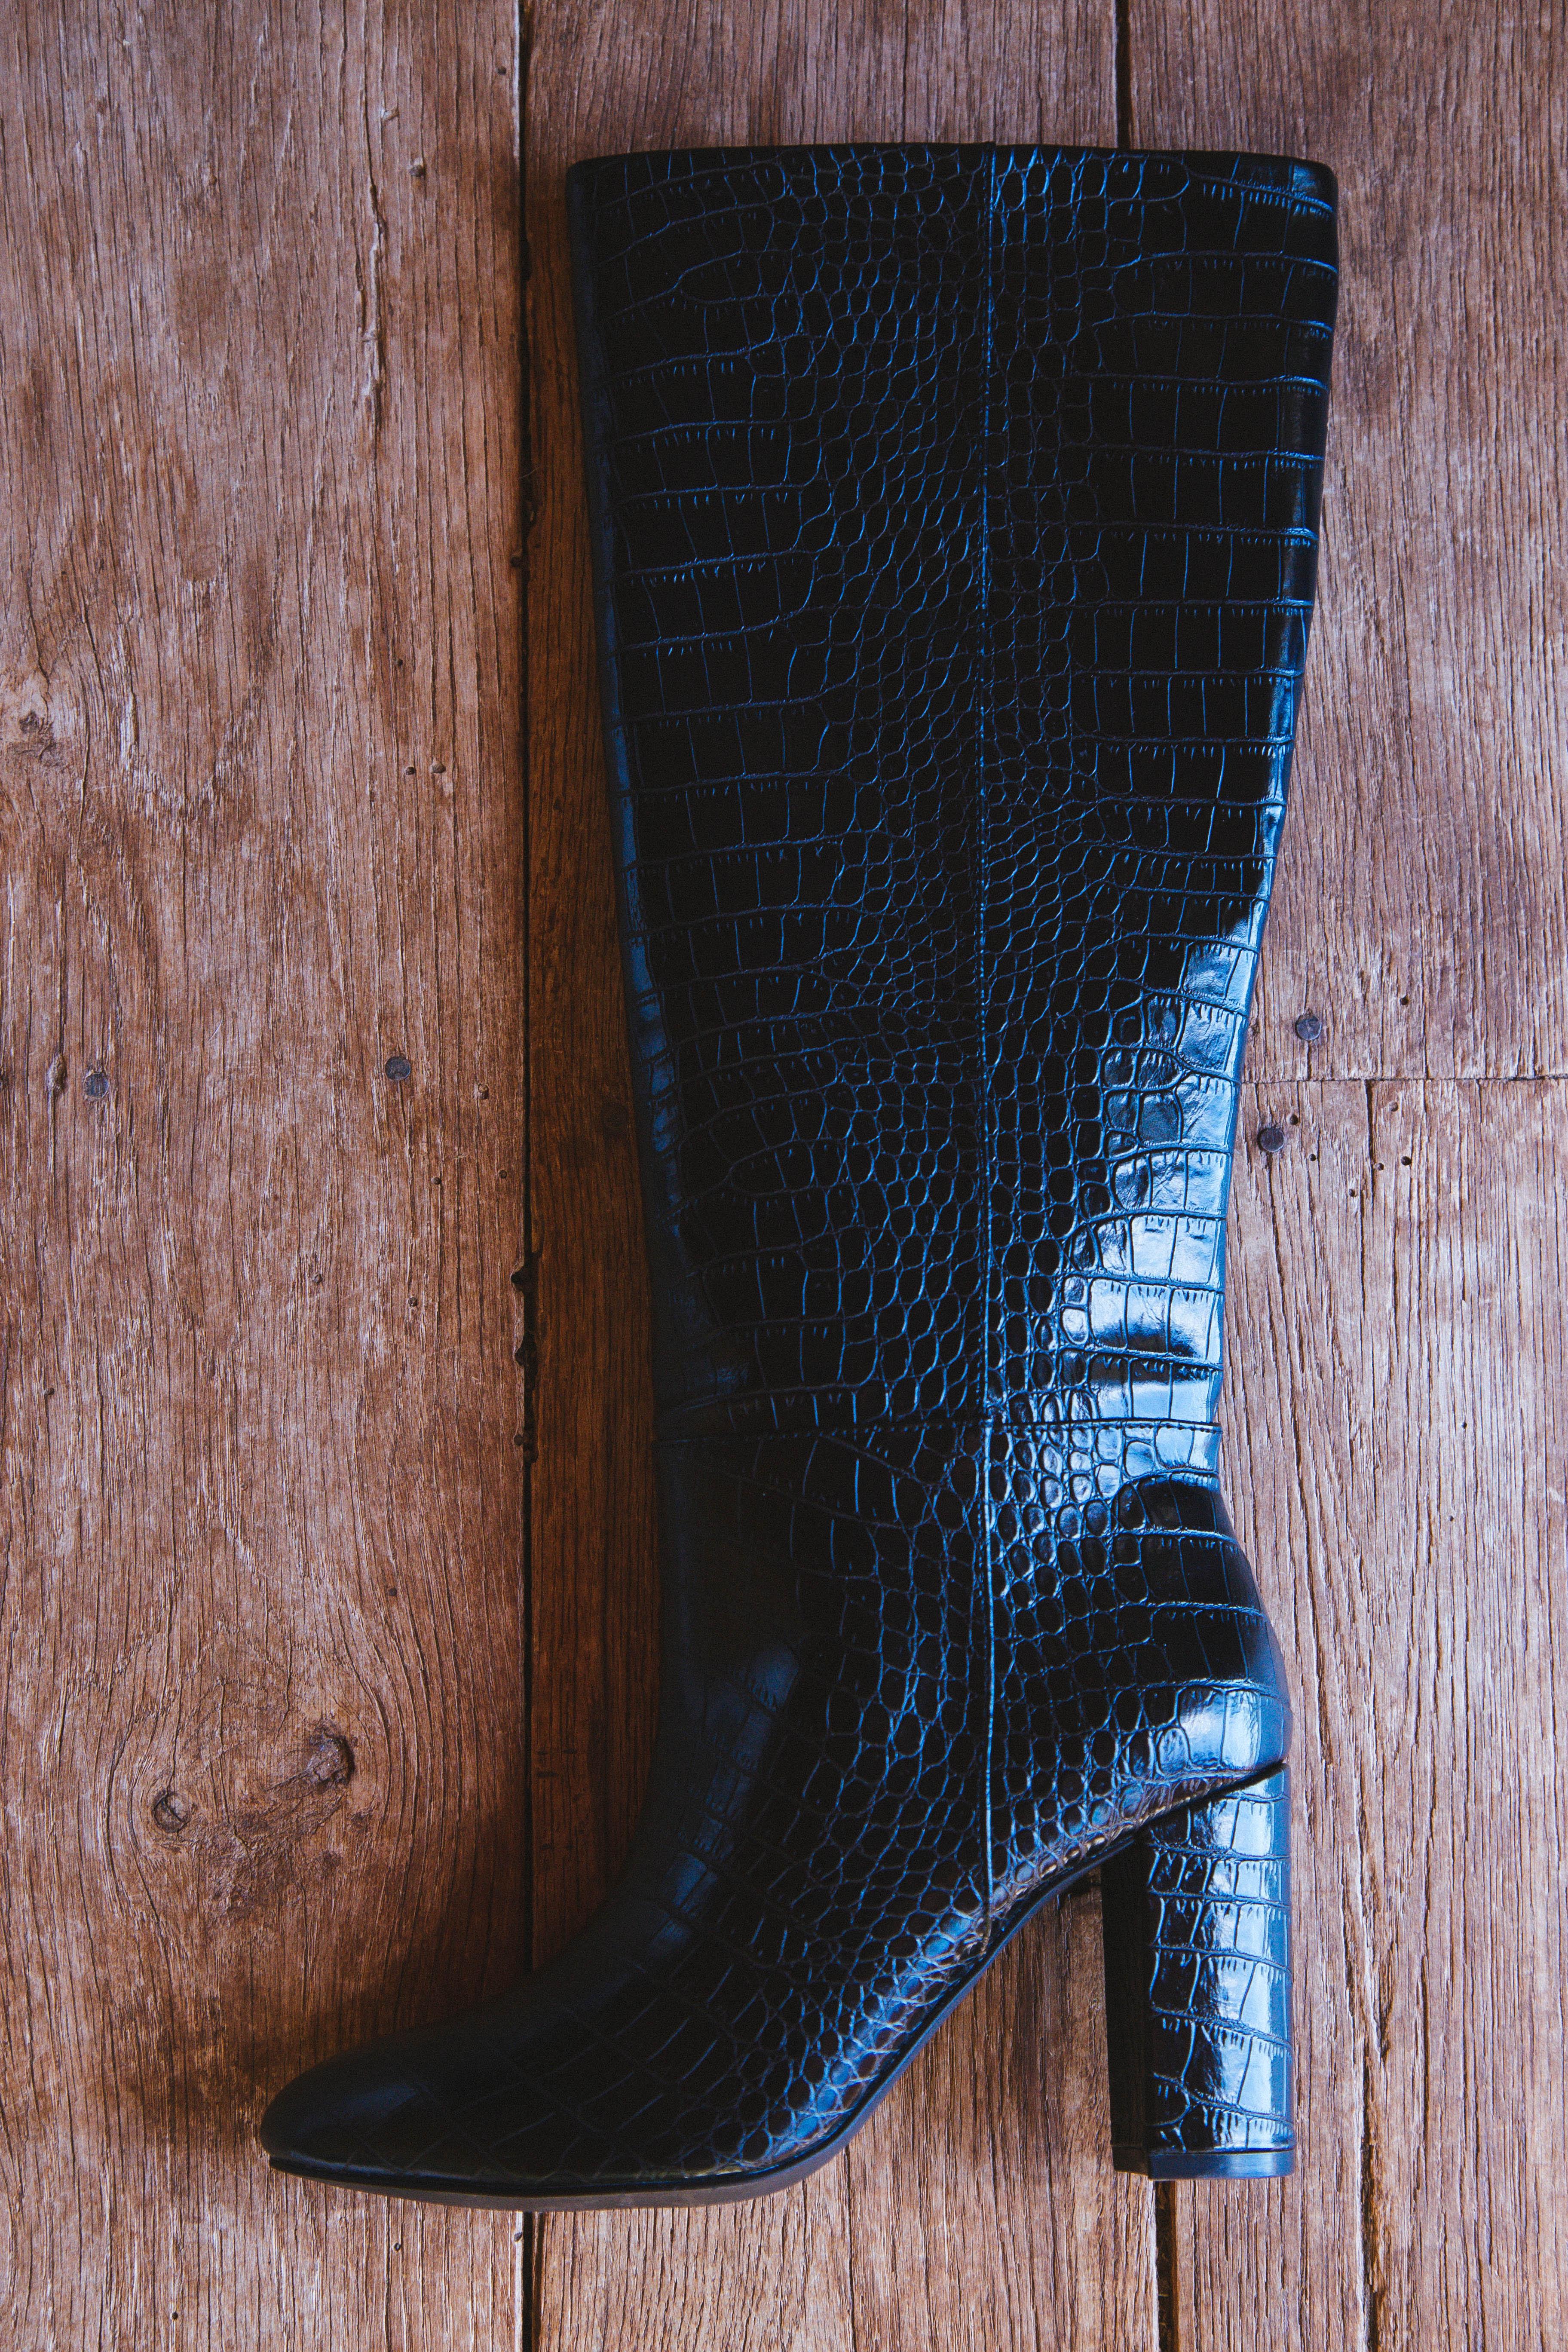 Krafty Croc Knee High Boot Black | Chinese Laundry